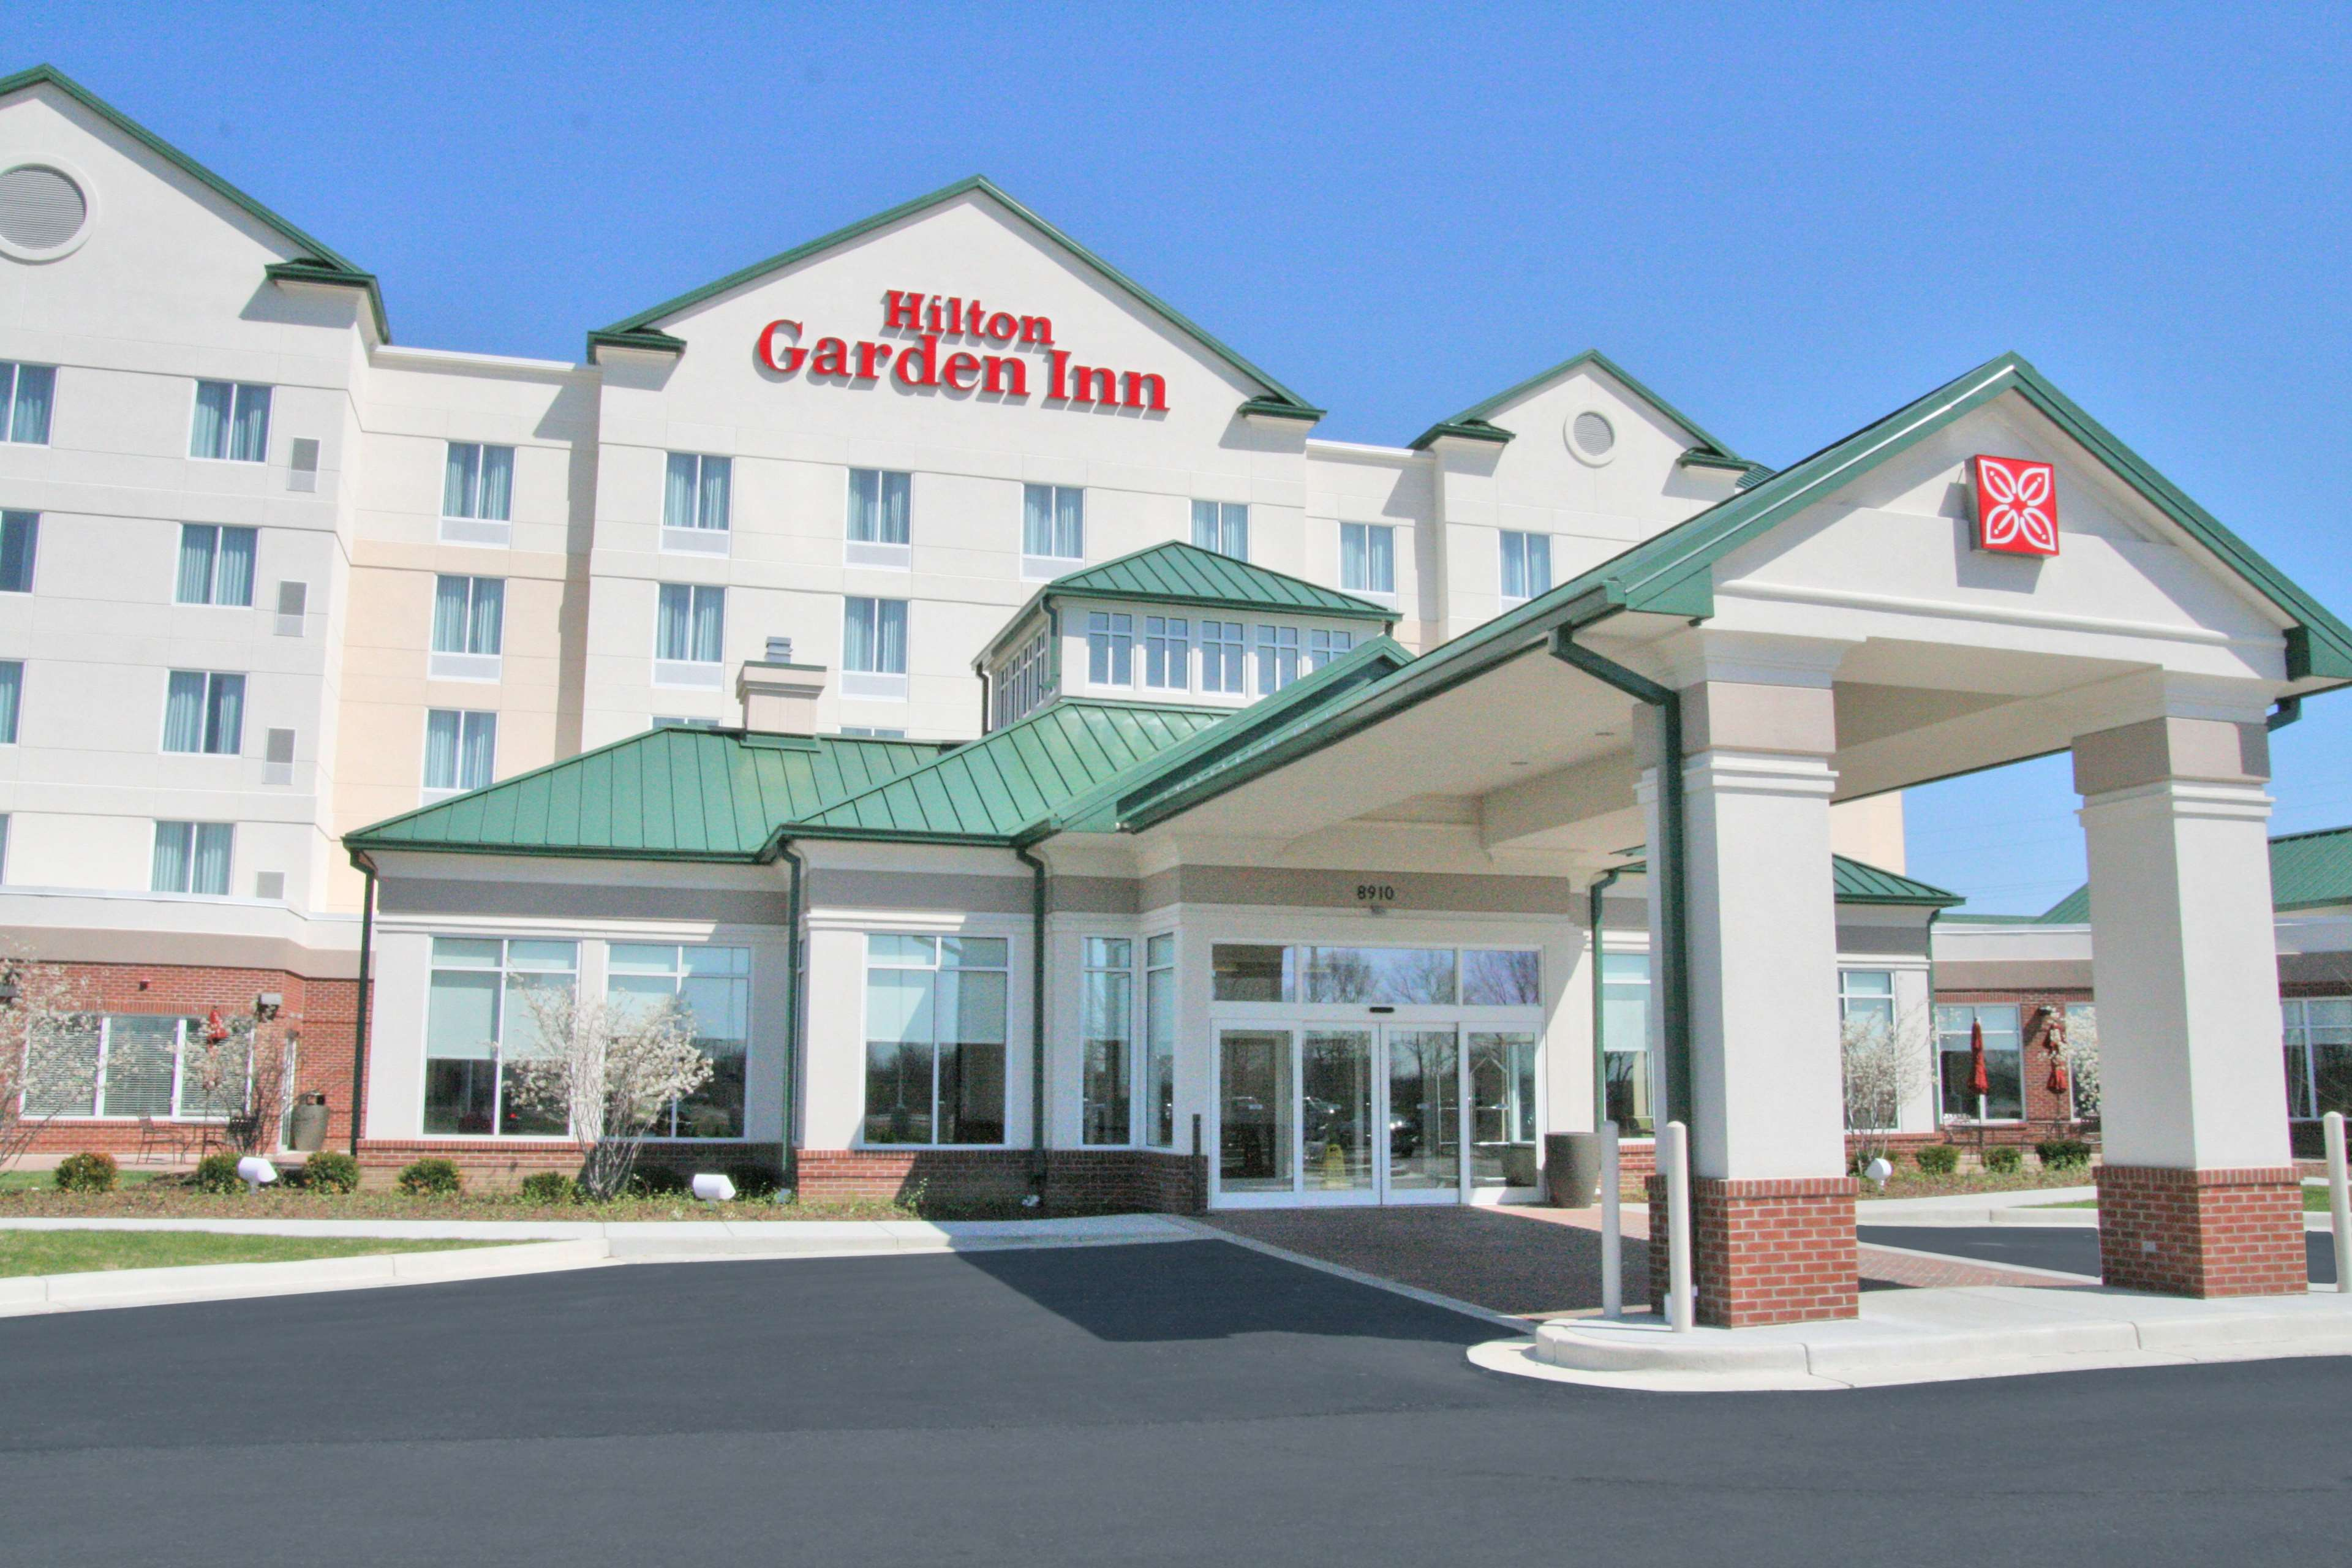 Hilton Garden Inn Indianapolis Airport image 1